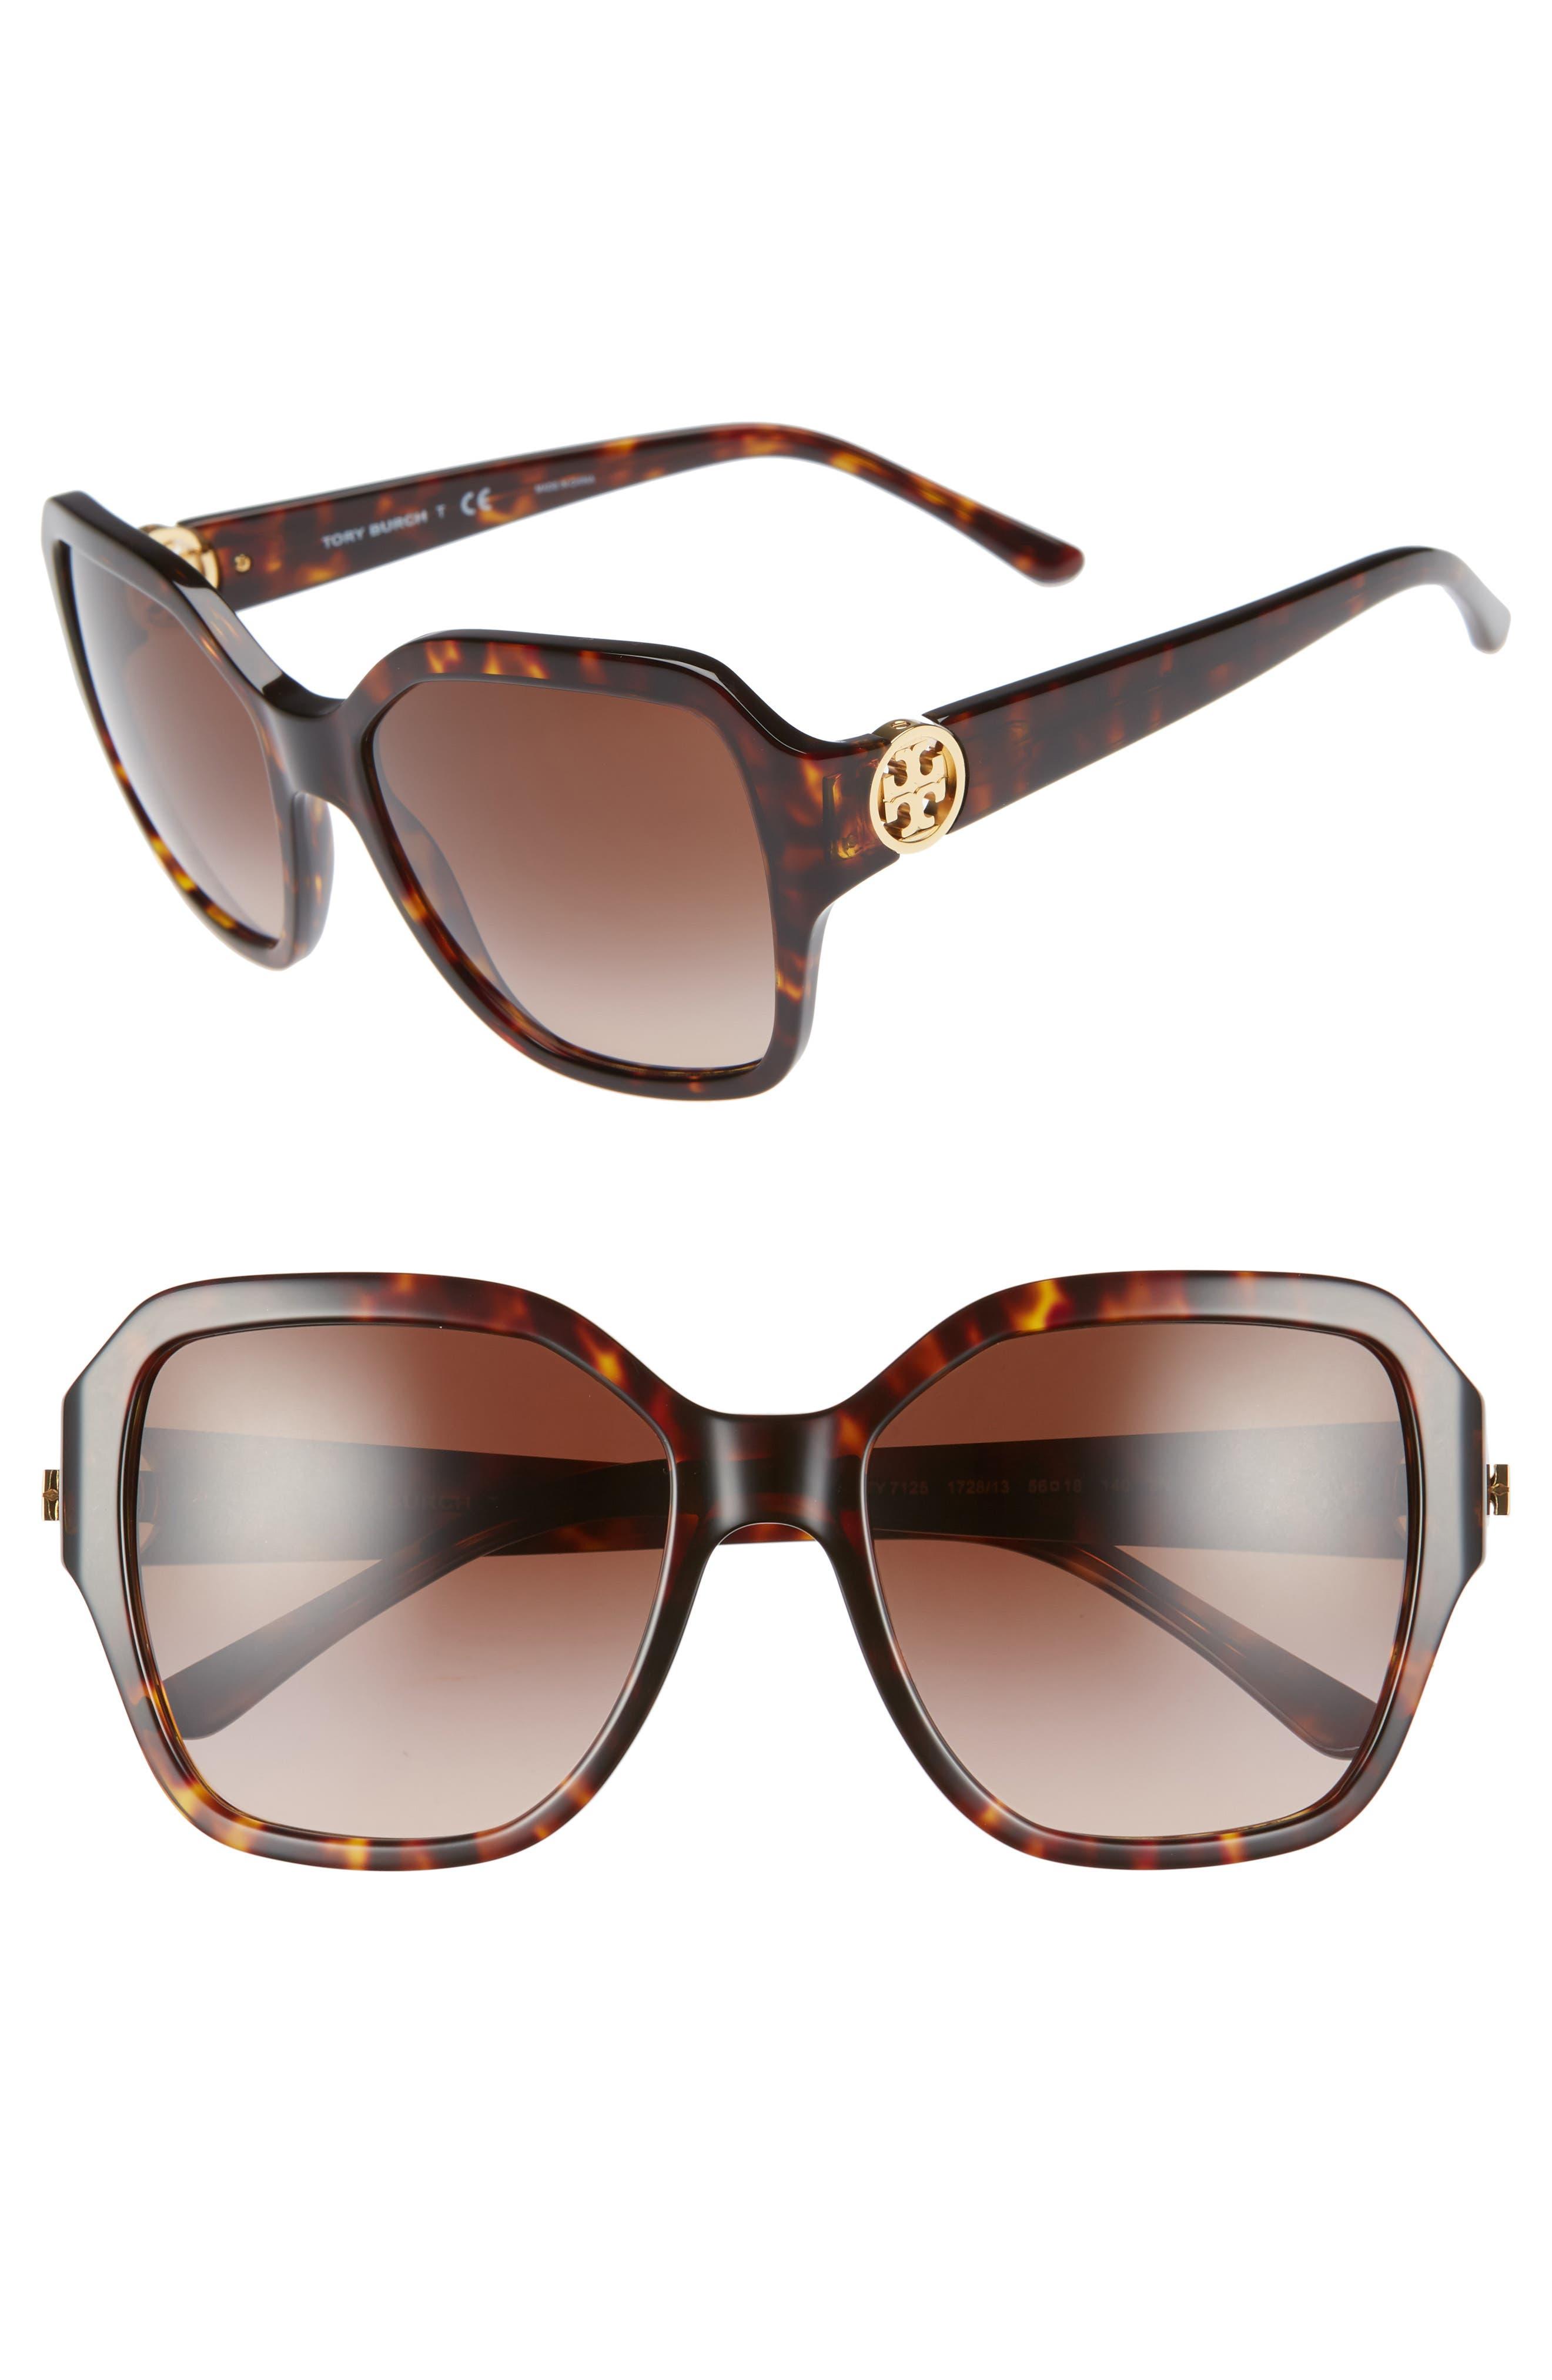 TORY BURCH, Reva 56mm Square Sunglasses, Main thumbnail 1, color, DARK TORTOISE GRADIENT